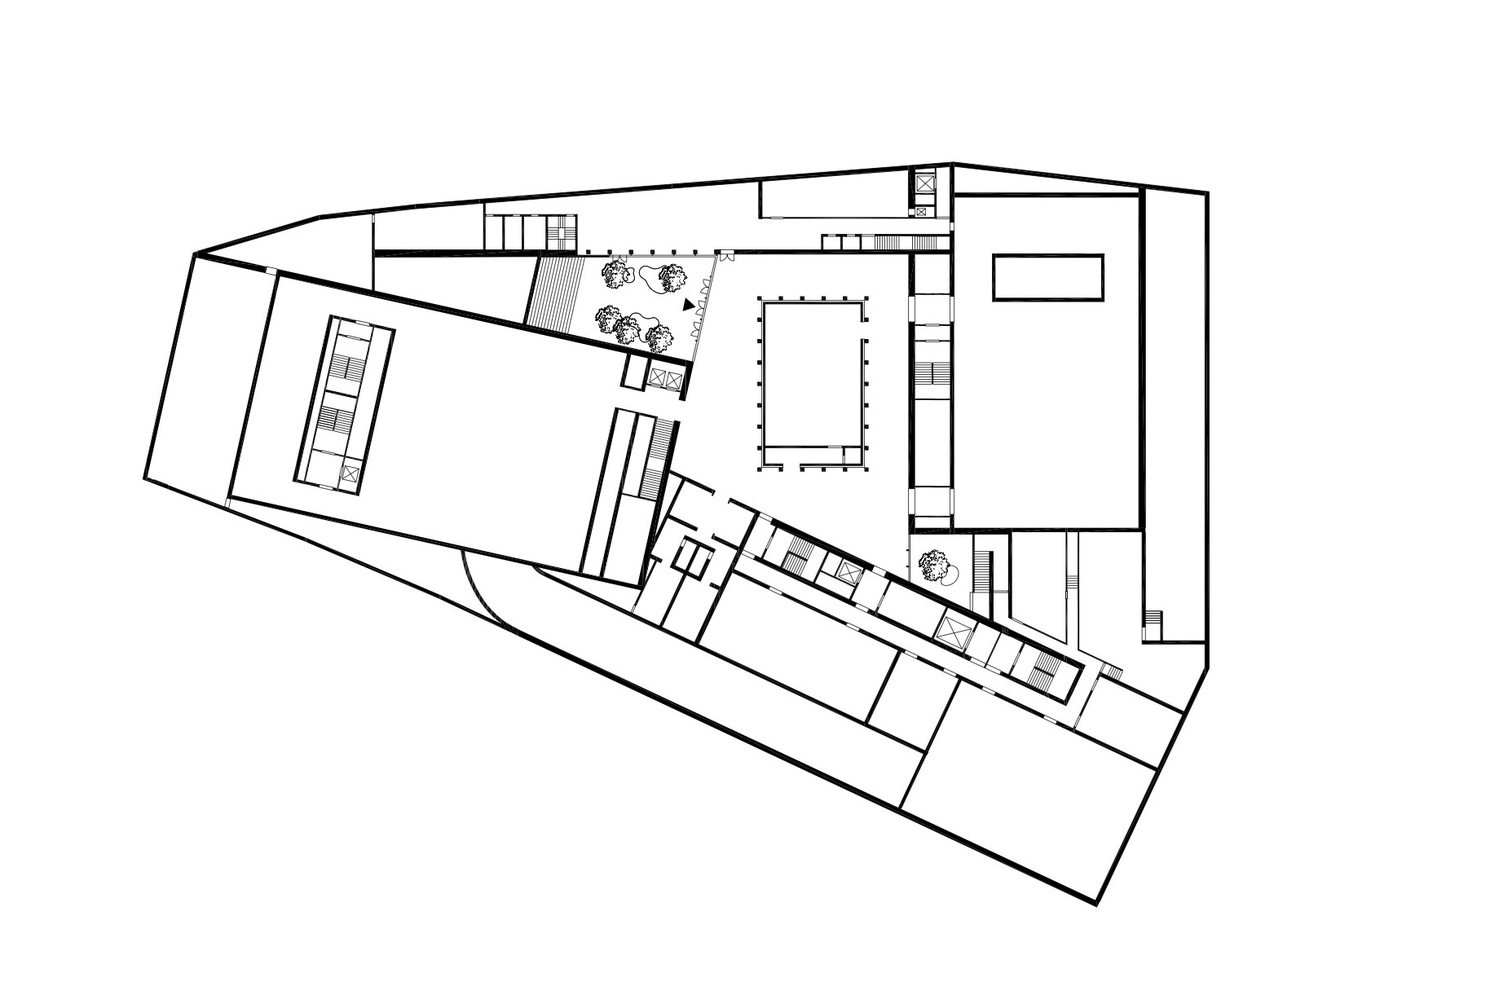 Gallery Of West Bund Museum David Chipperfield Architects 16